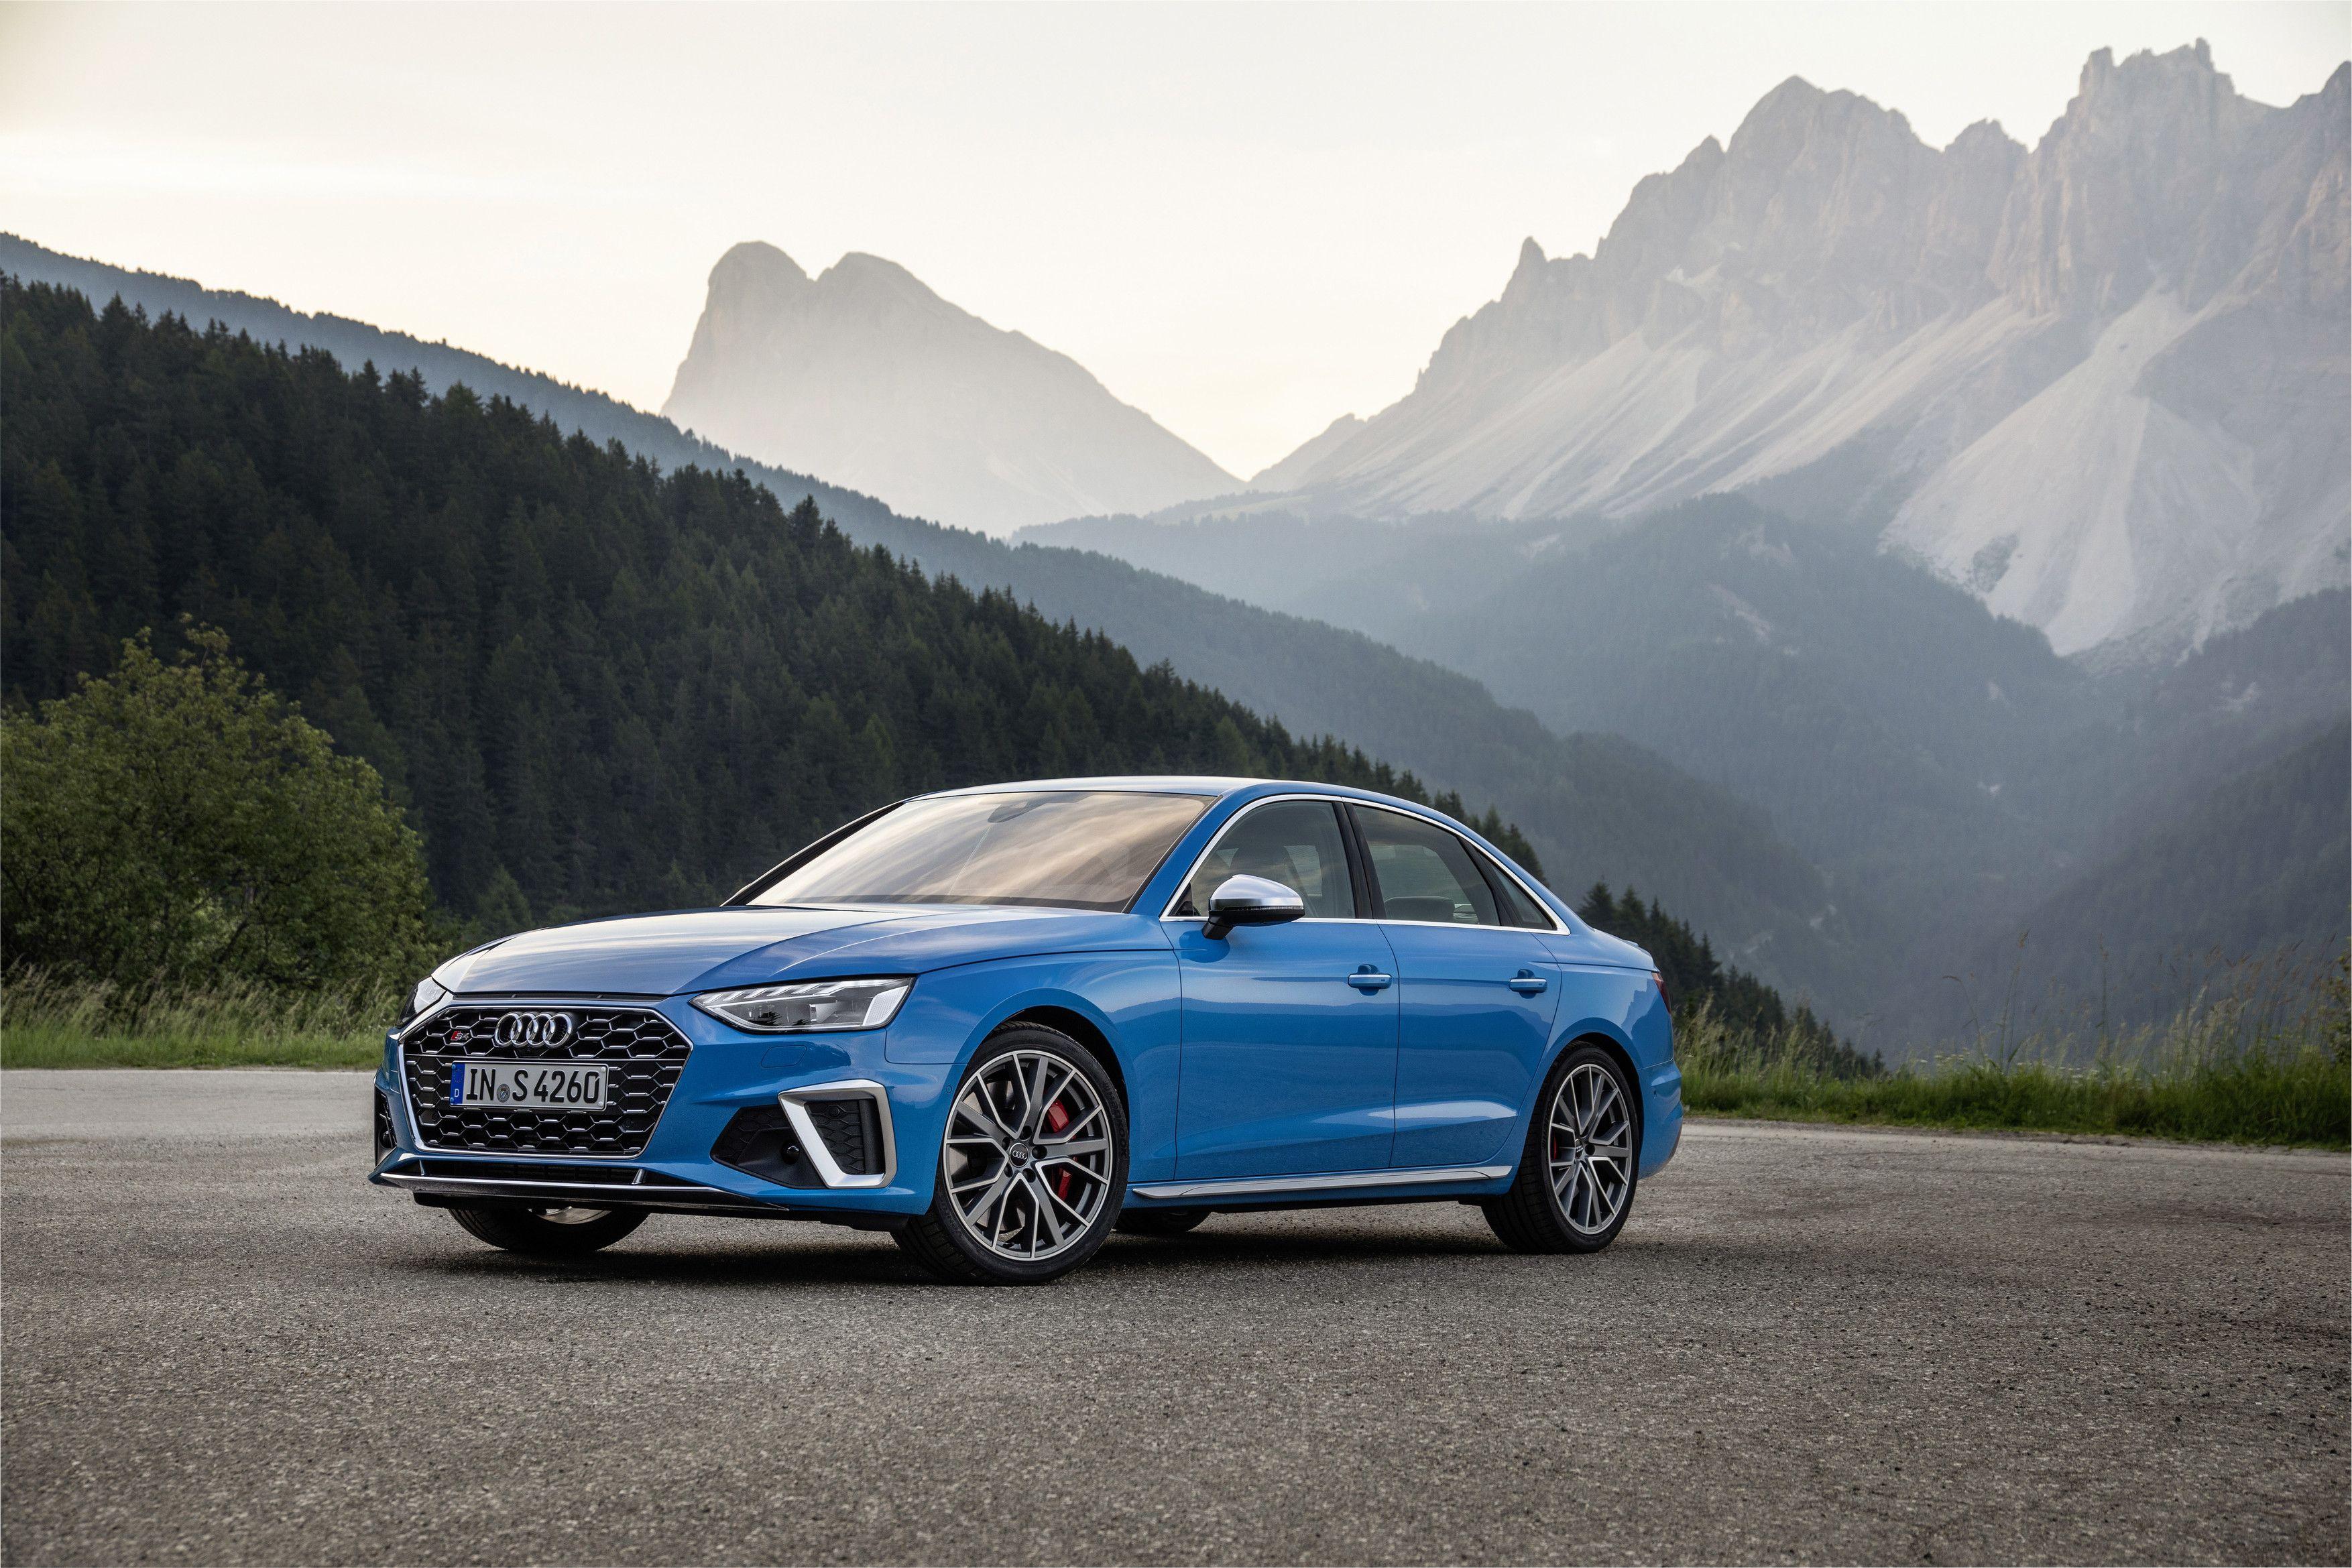 2020 Audi S4 Reviews